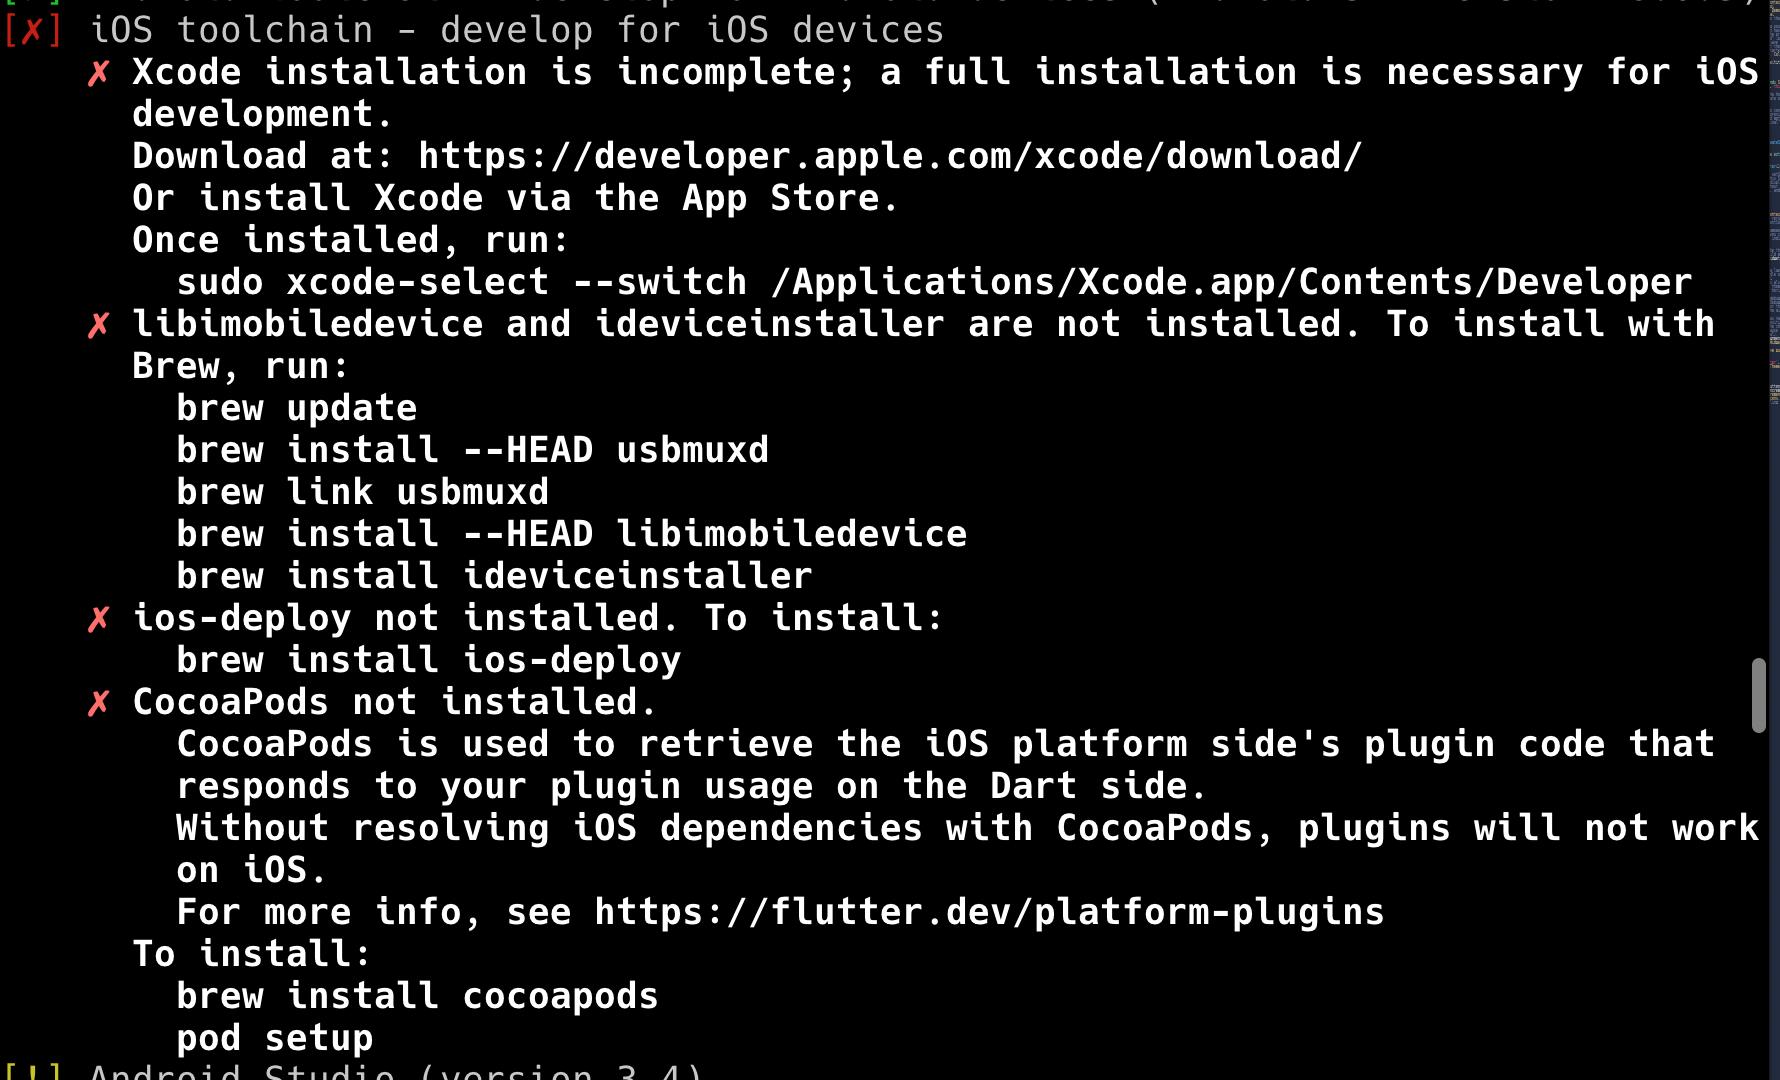 MAC 需要安卓的依赖